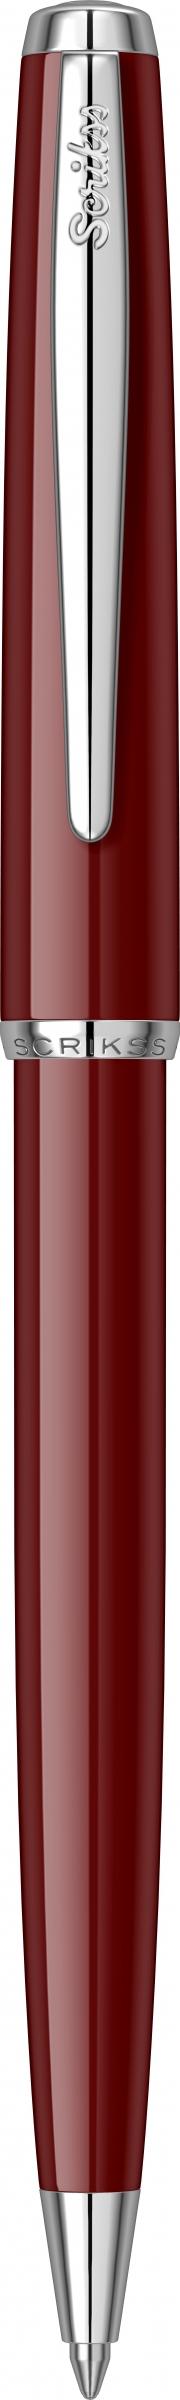 Burgundy CT